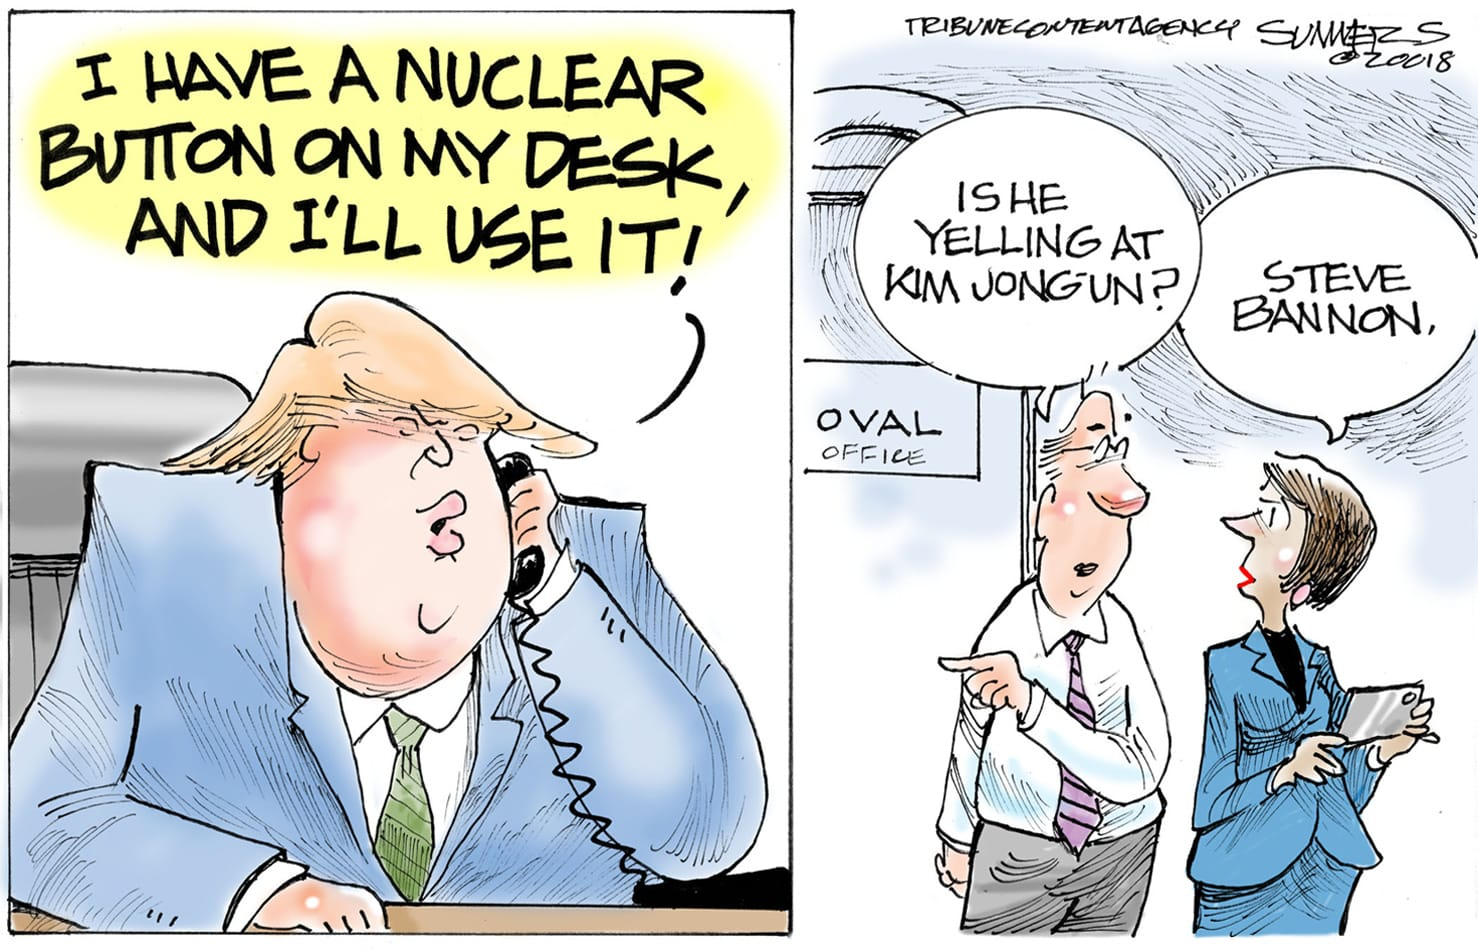 Jan. 6: Trump and Bannon